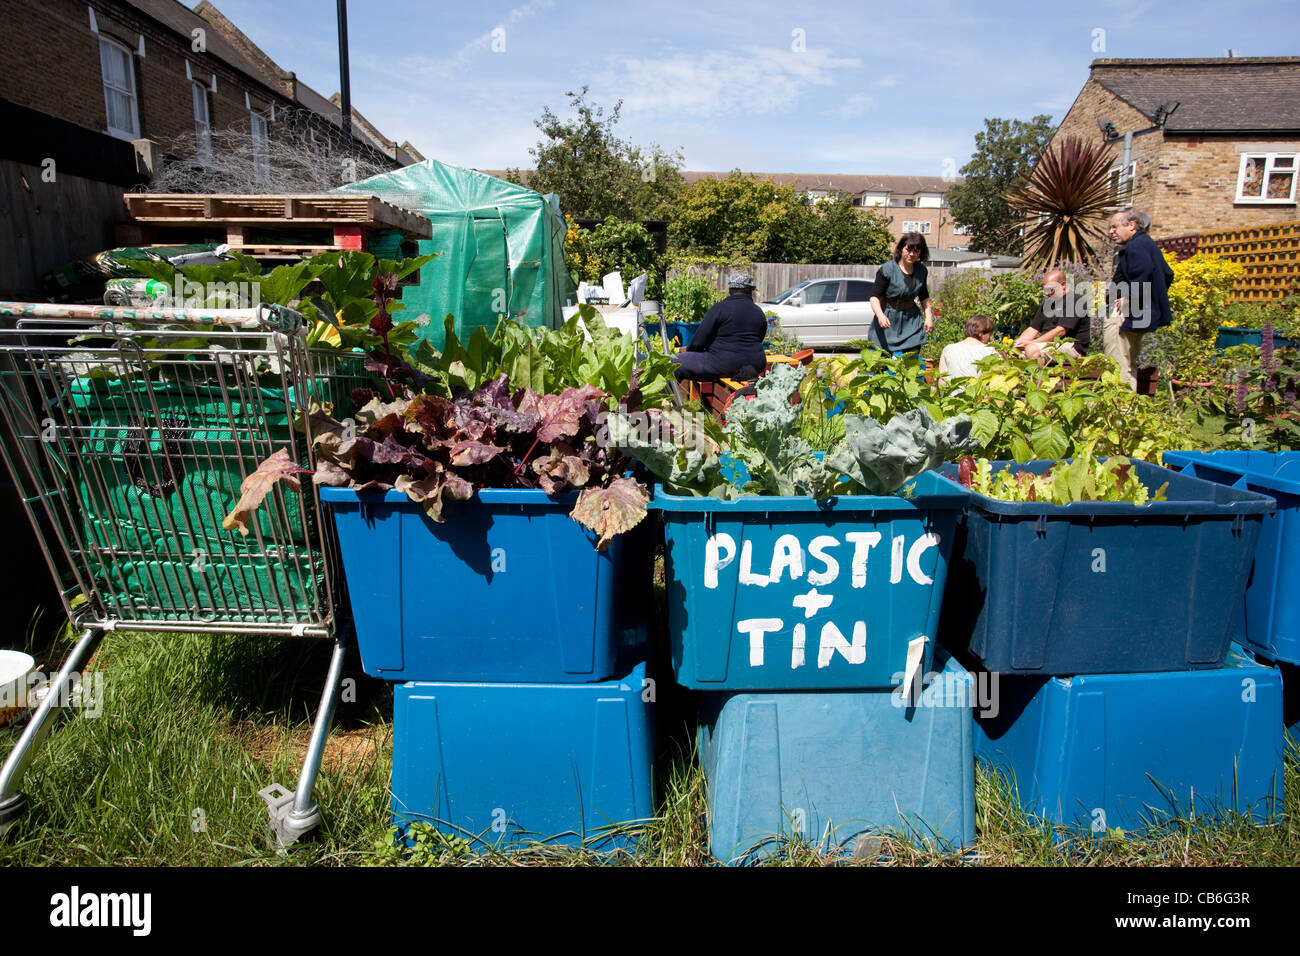 Pembroke Community Garden Urban Communal Garden, South East London, UK. Photo:Jeff Gilbert - Stock Image